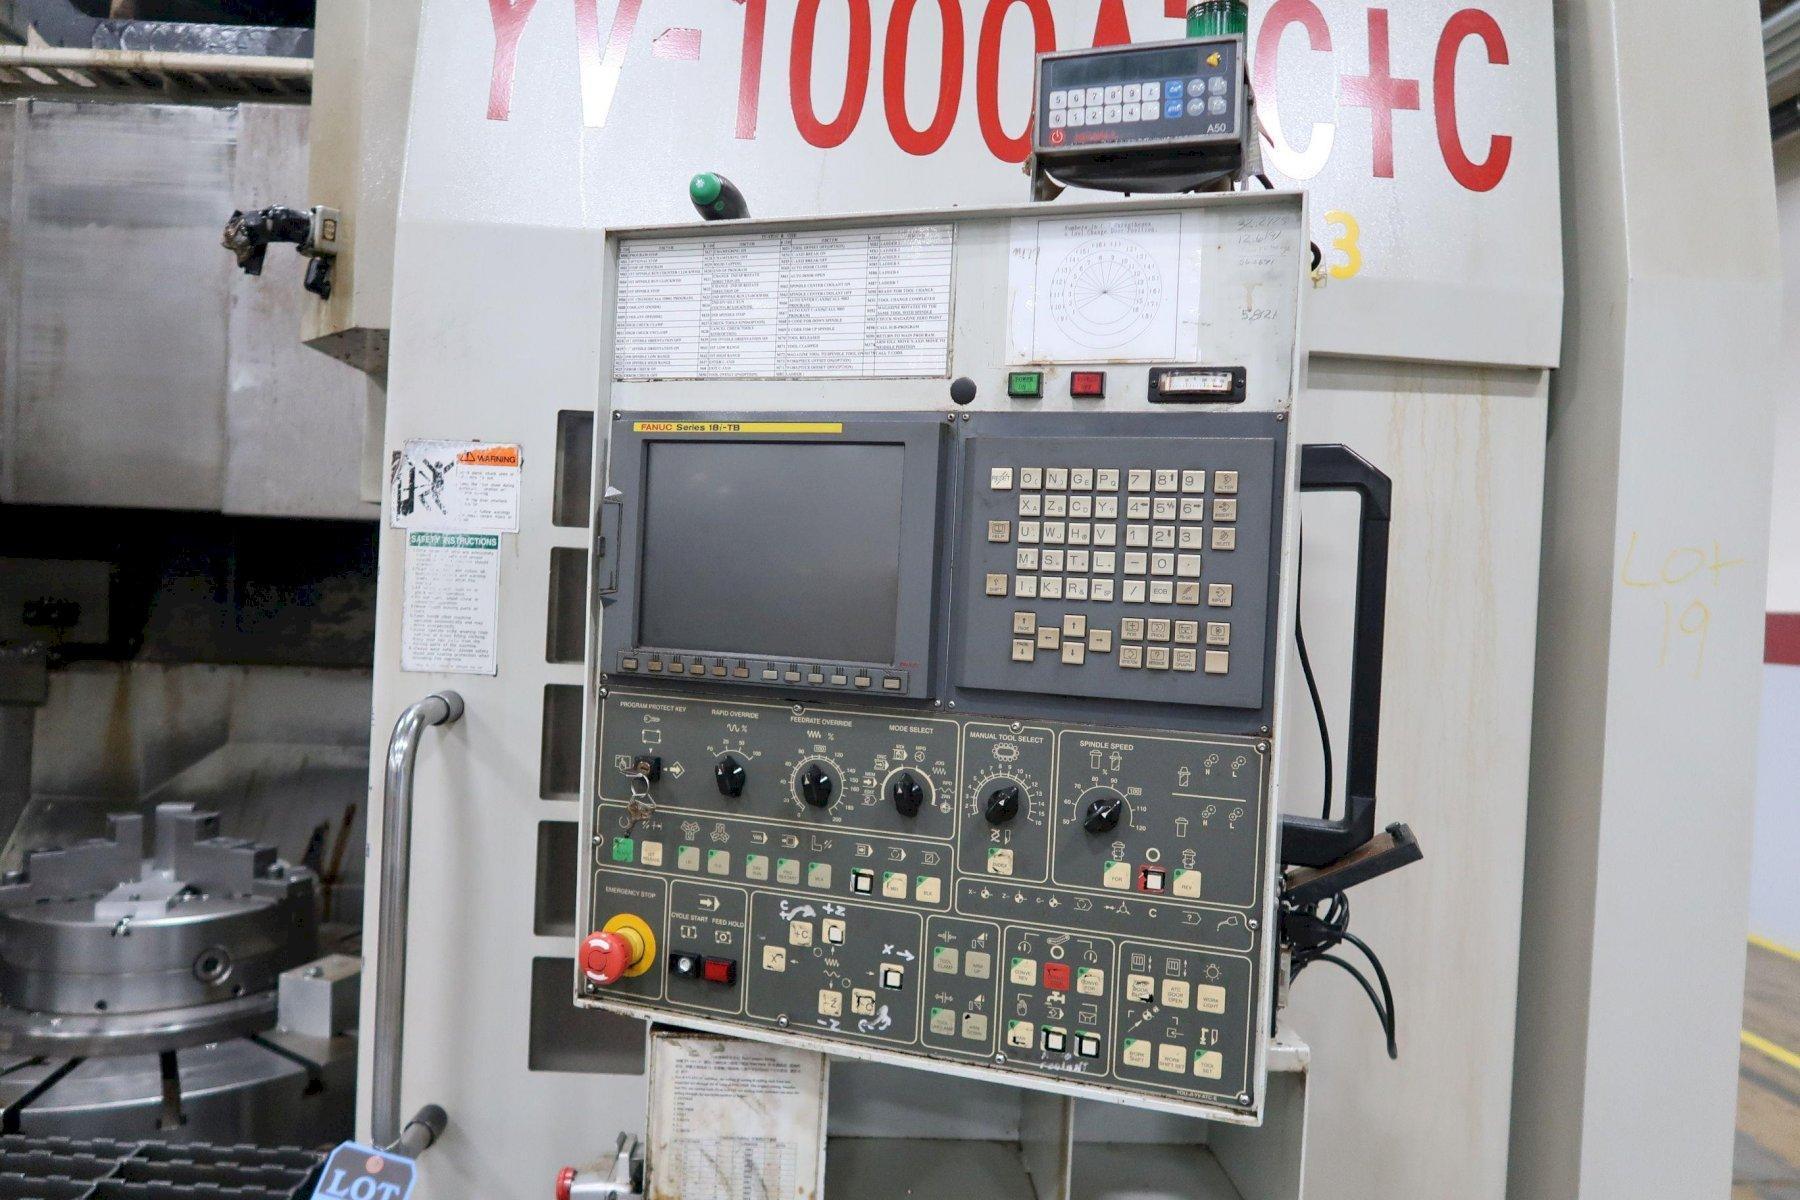 "You Ji YV1000ATC+C CNC Vertical Lathe w/Milling, Fanuc 18i-TC, 20"" Chuck, 39.4"" Table Dia, 53"" S"